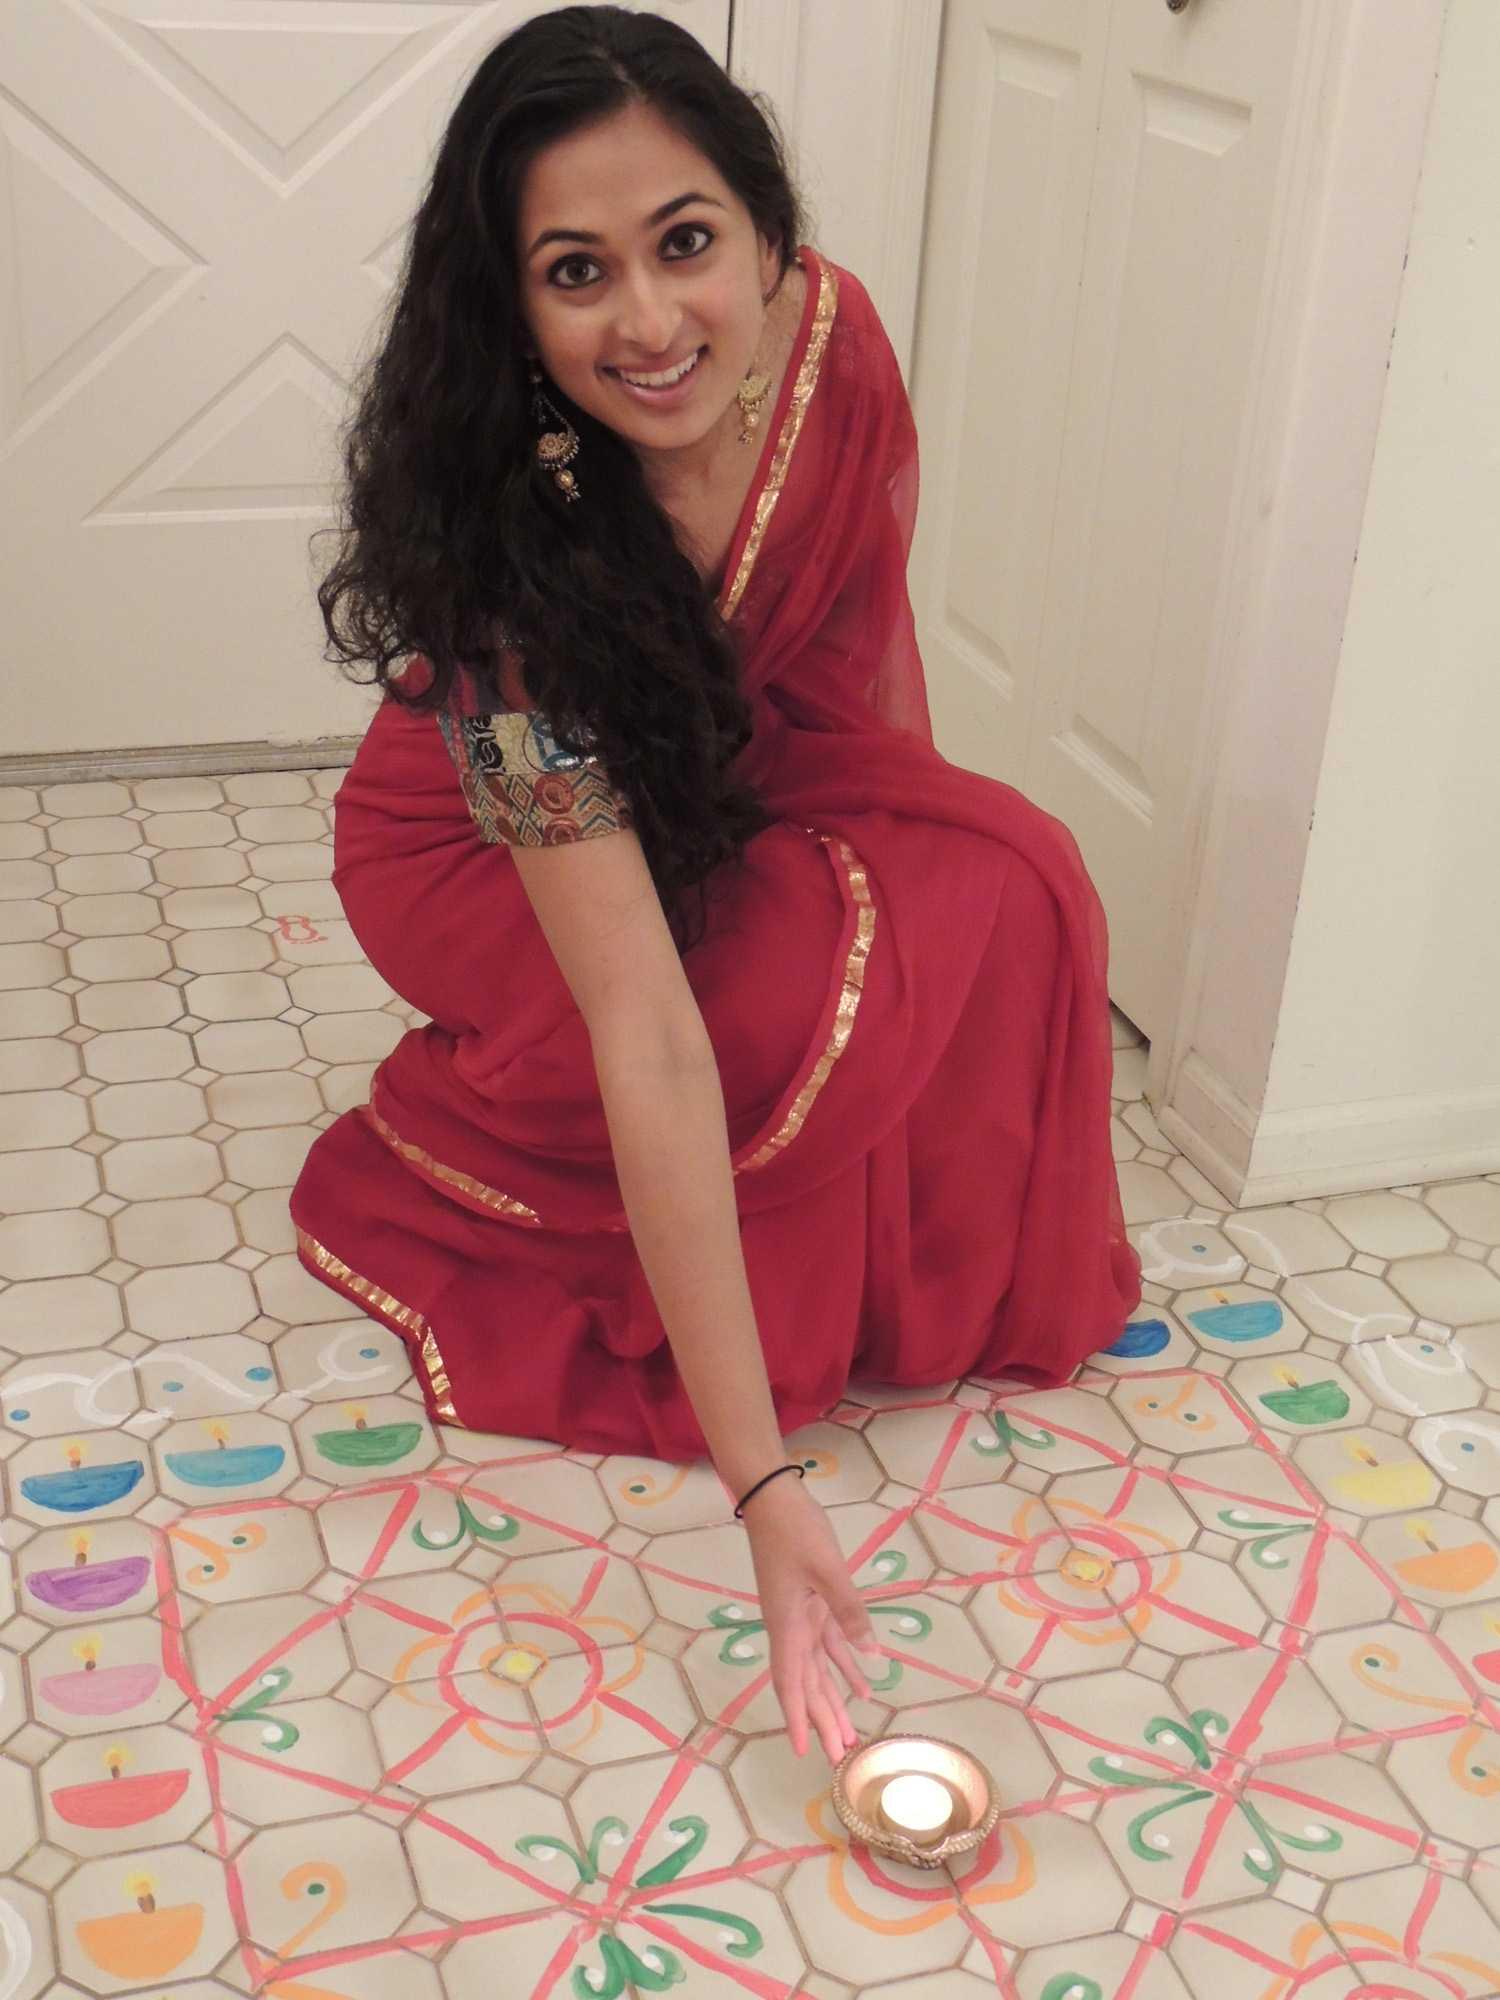 Photo of Megha Mathur celebrating Diwali at home.